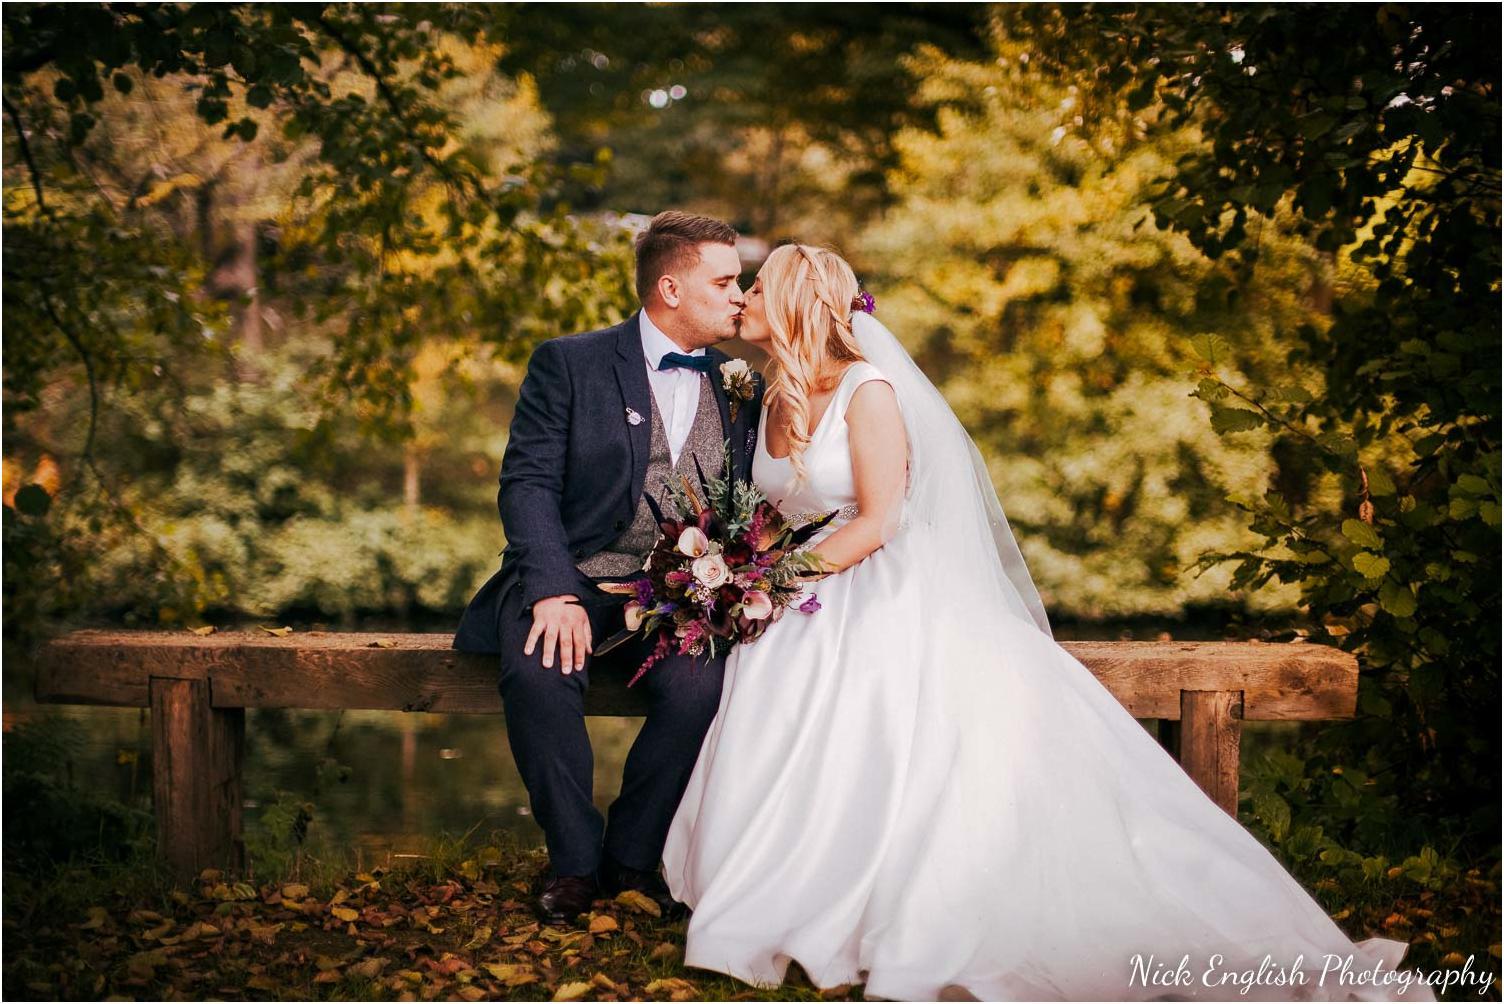 The_Ashes_Barn_Endon_Stoke_Wedding_Photographer-76.jpg